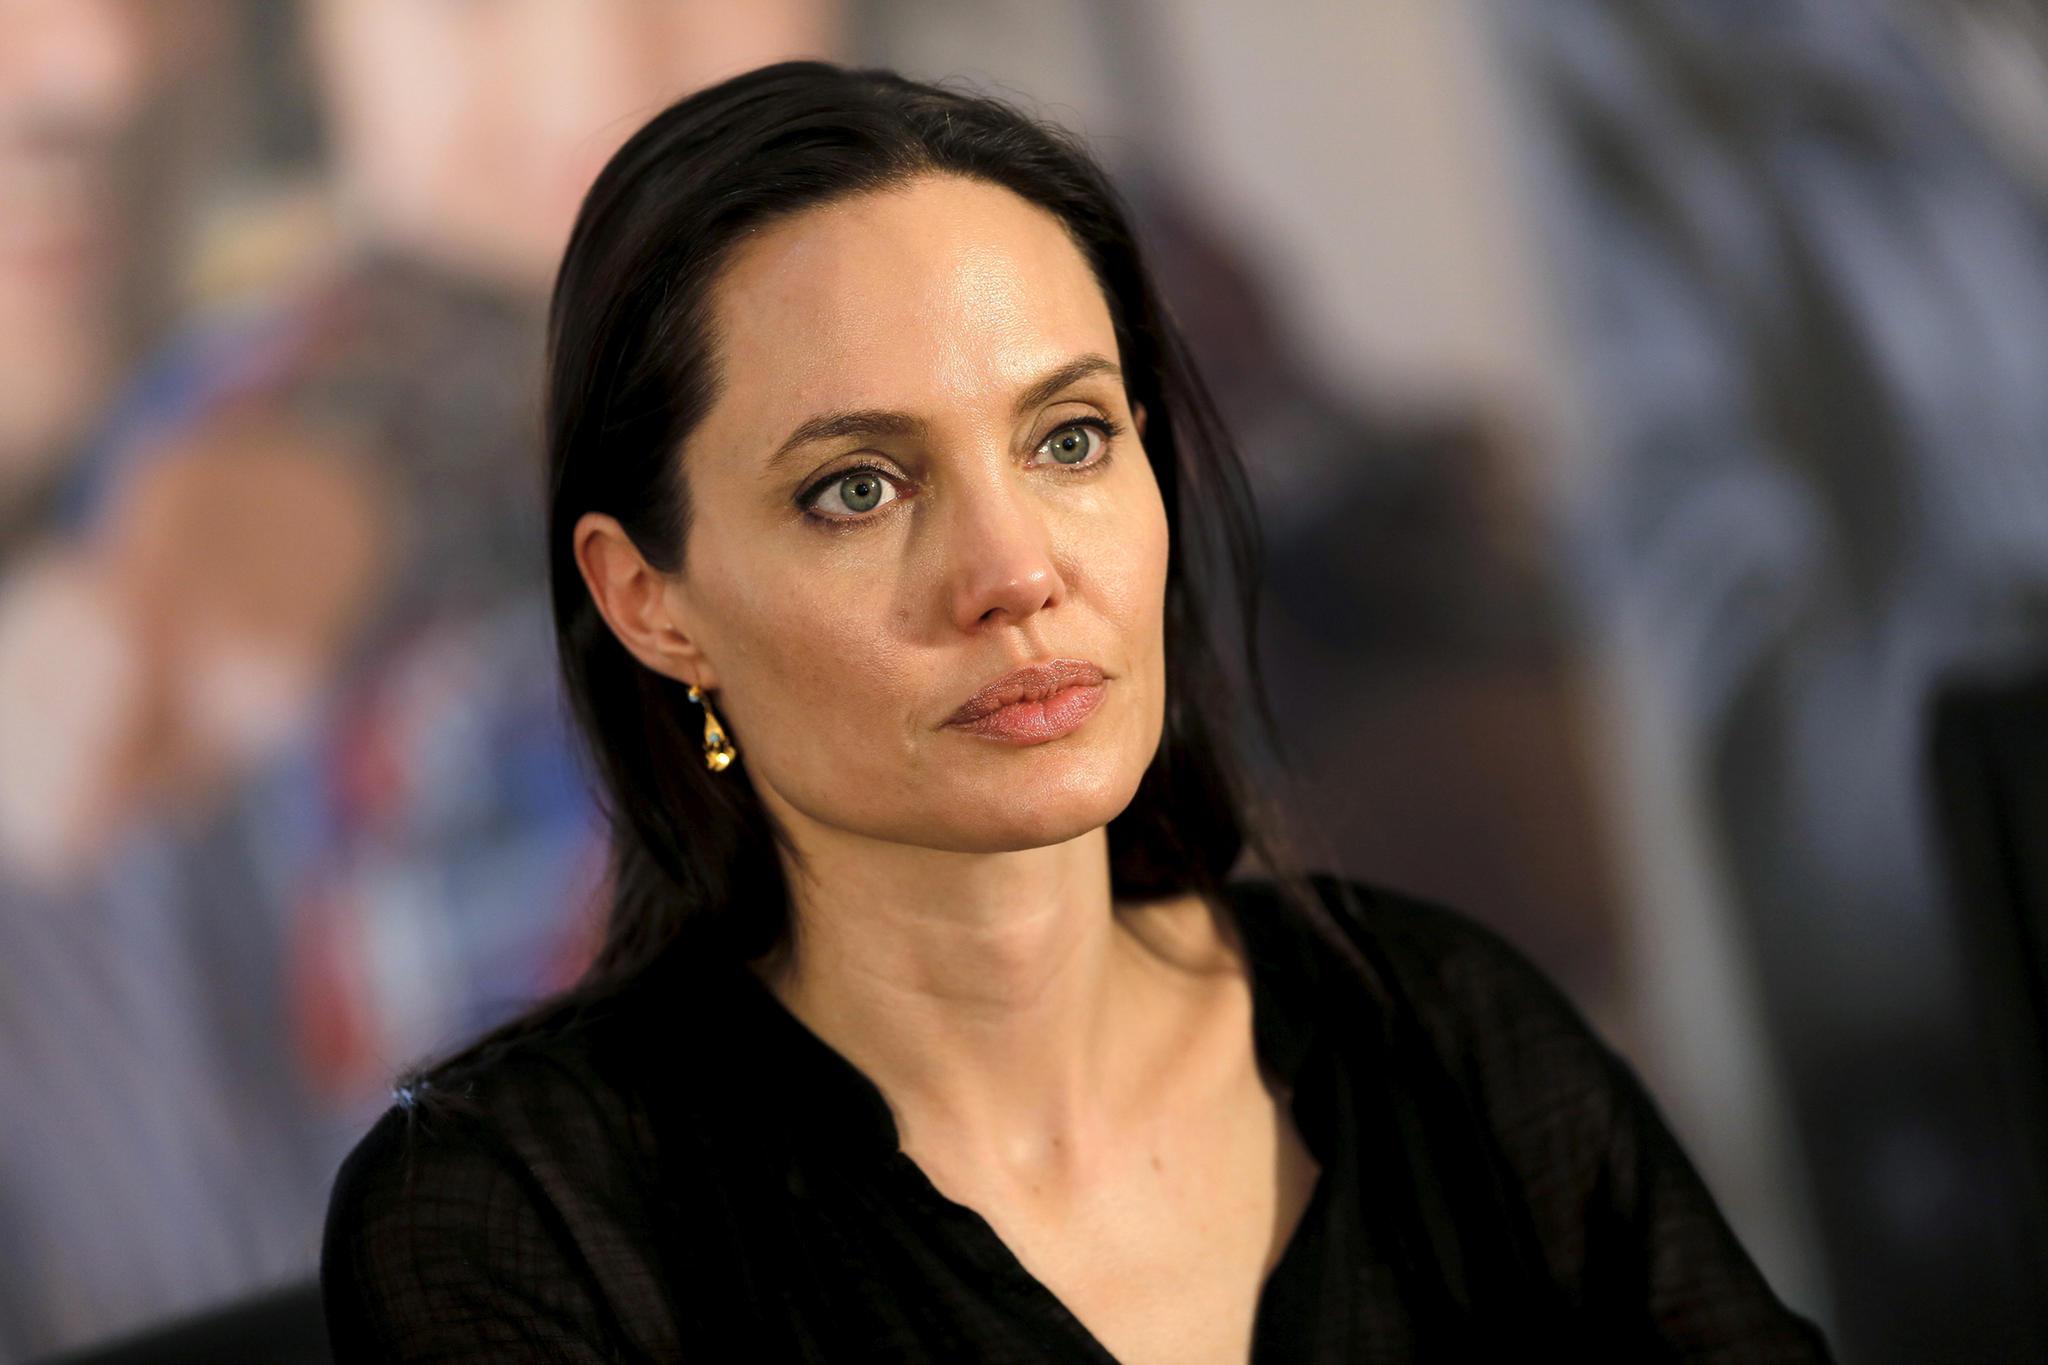 Hat Angelina Jolie Kinder grausam behandelt?